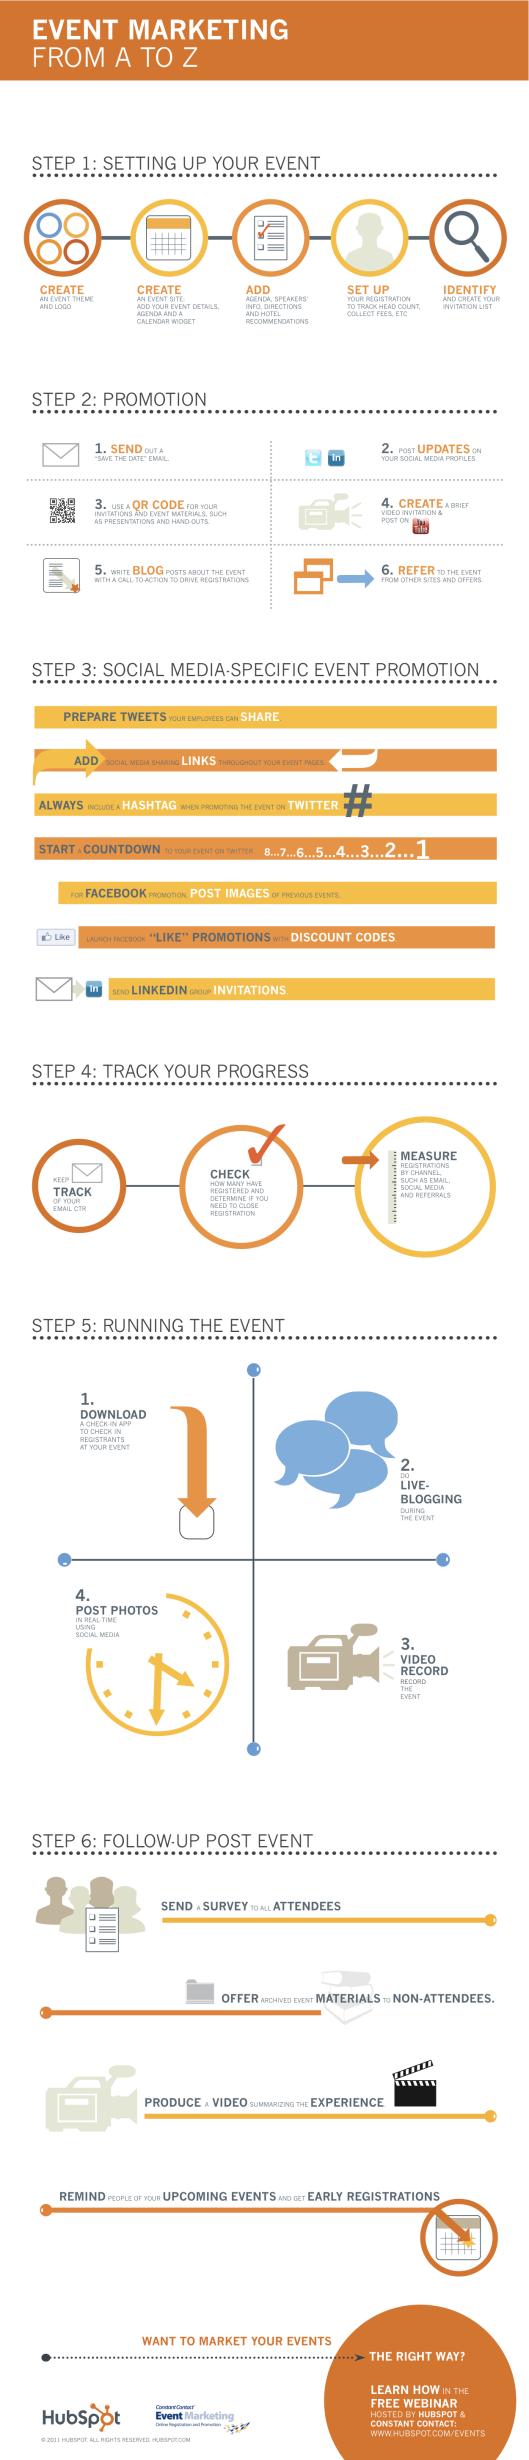 event_marketing_infographic_Hubspot